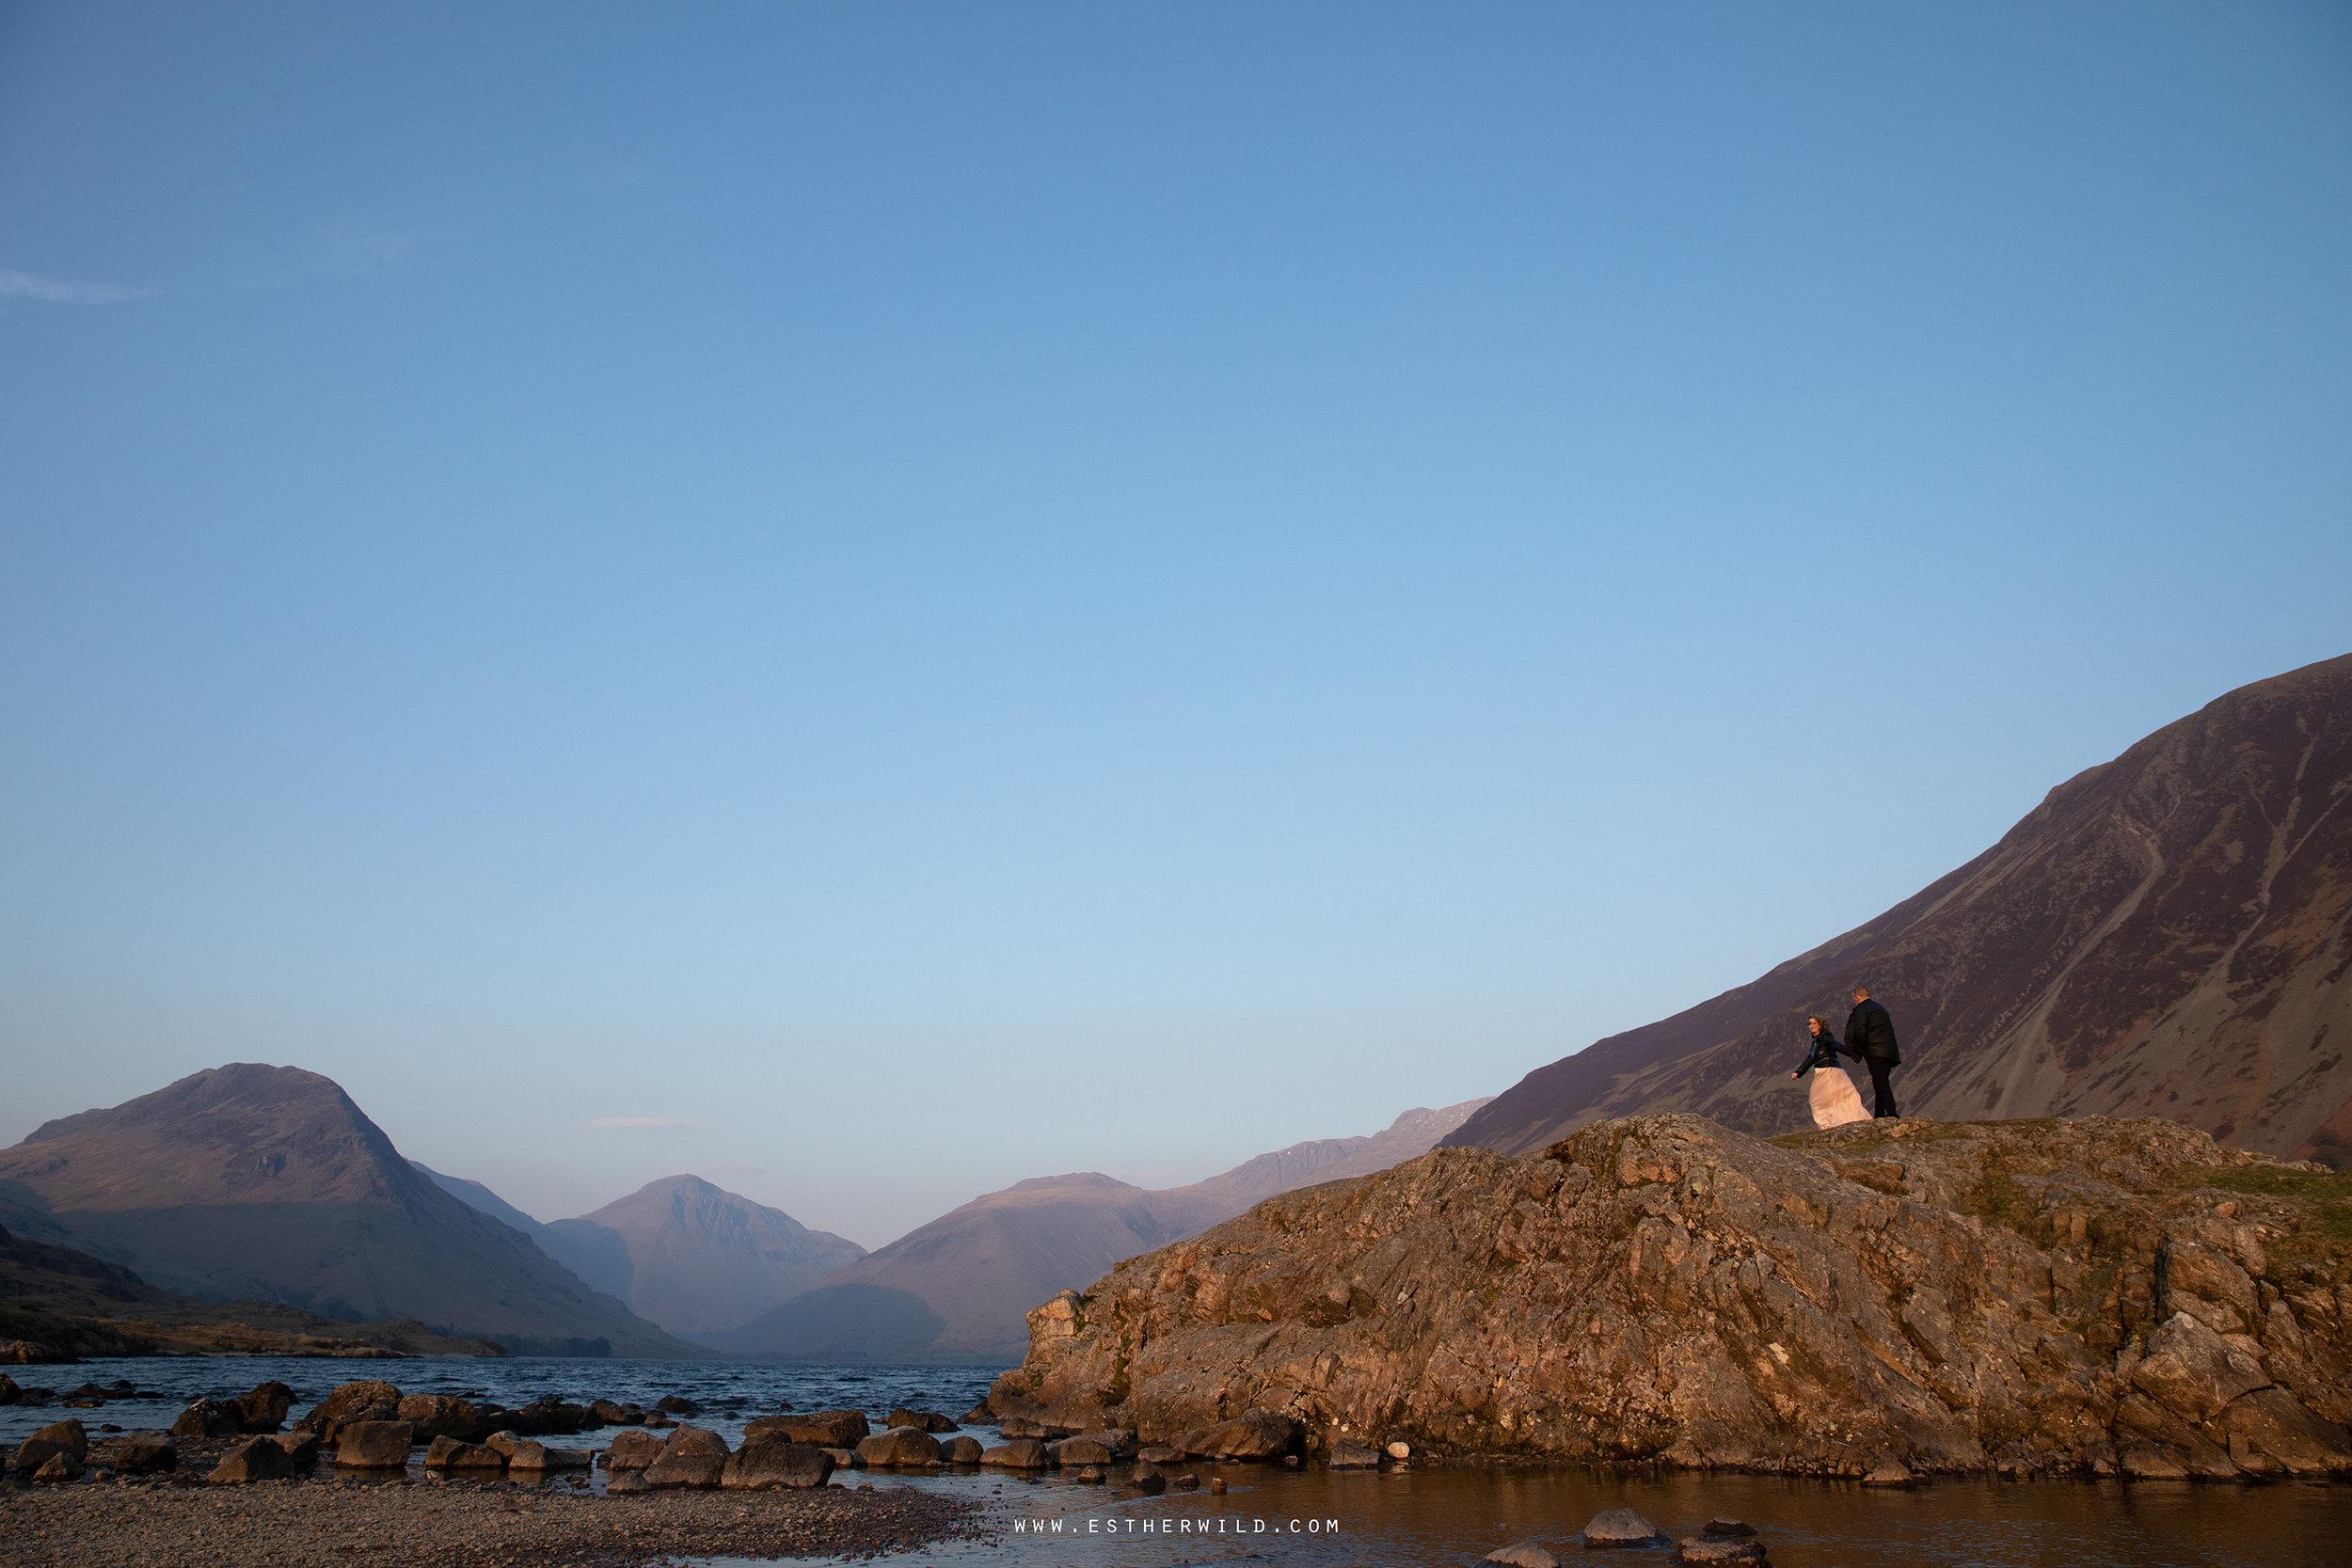 Cumbria_Lake_District_Wasdale_Wedding_Photographer_Destination_Engagement_Anniversary_Esther_Wild_IMG_4661.jpg